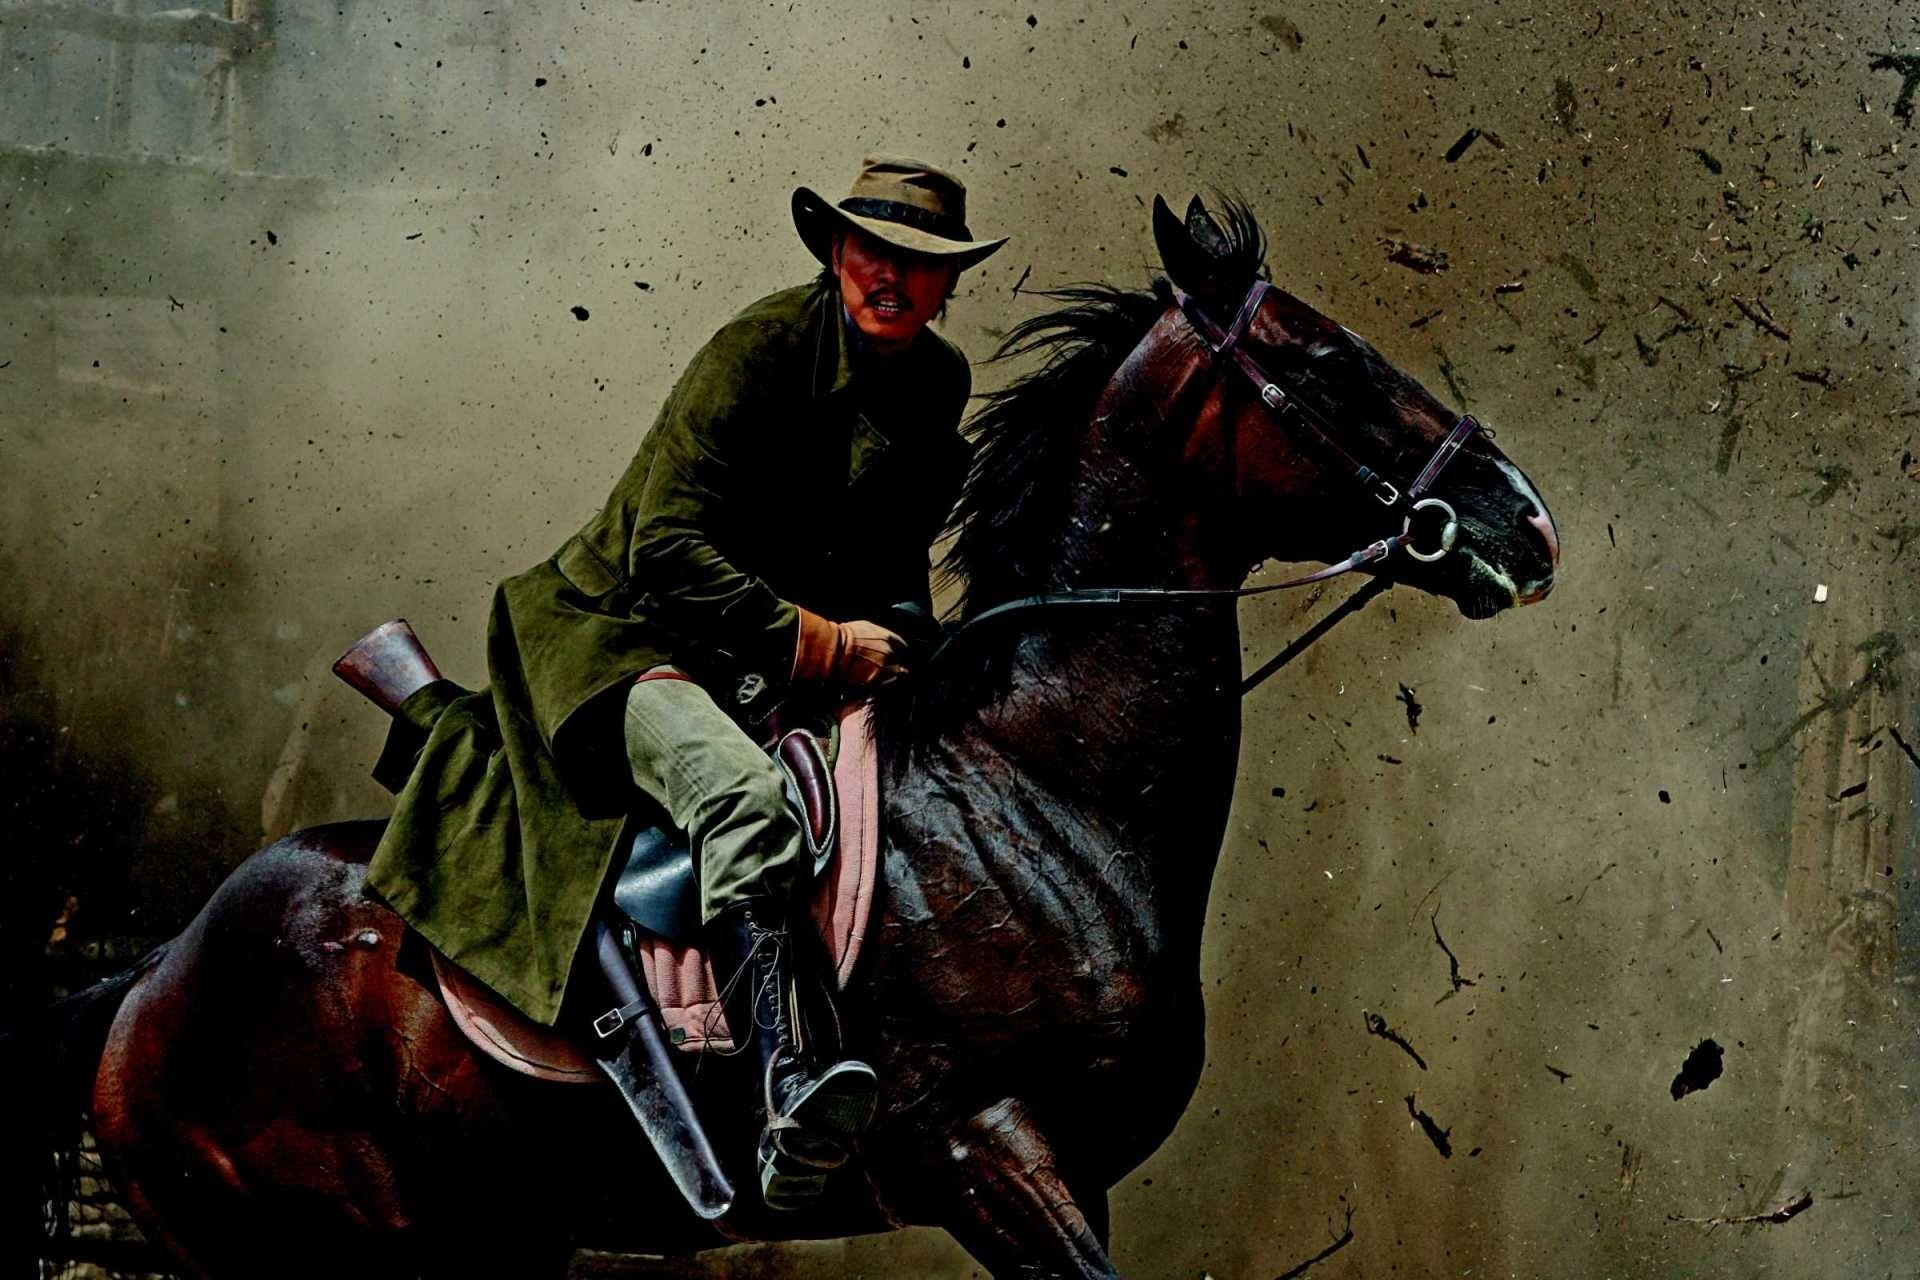 western cowboy wallpaper 70 images